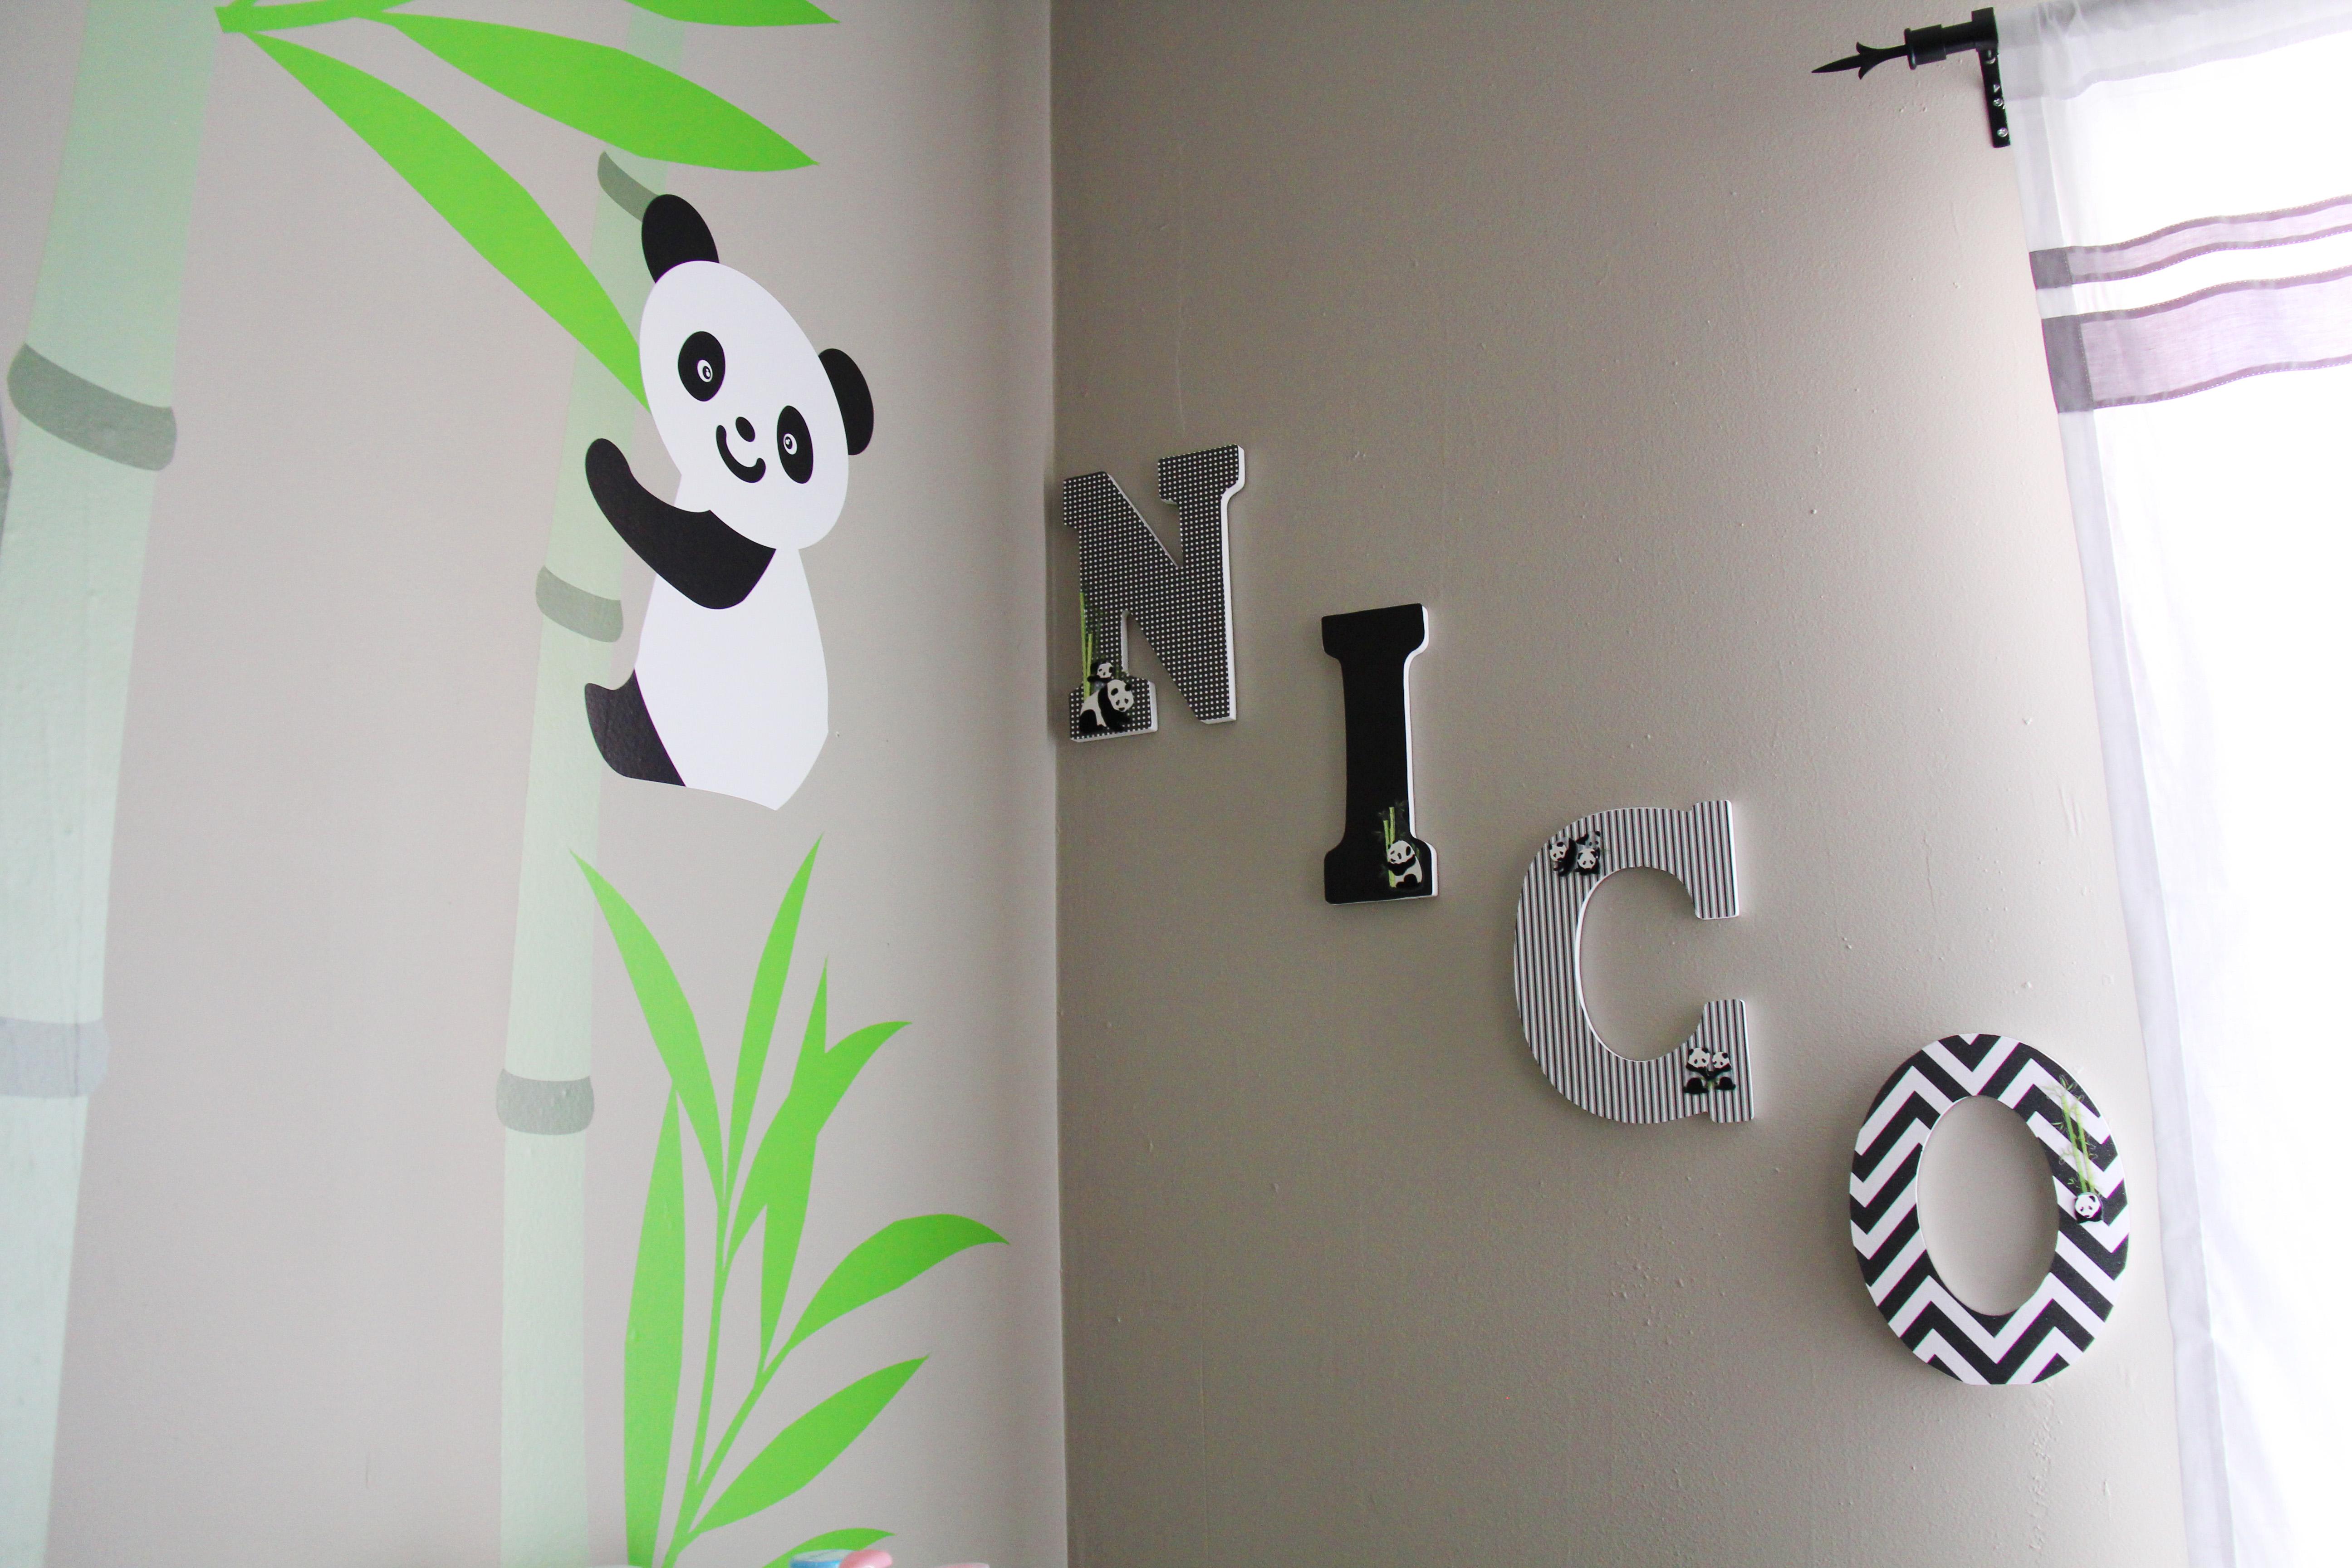 diy decorate wooden letters for nursery popcorn and pandas. Black Bedroom Furniture Sets. Home Design Ideas